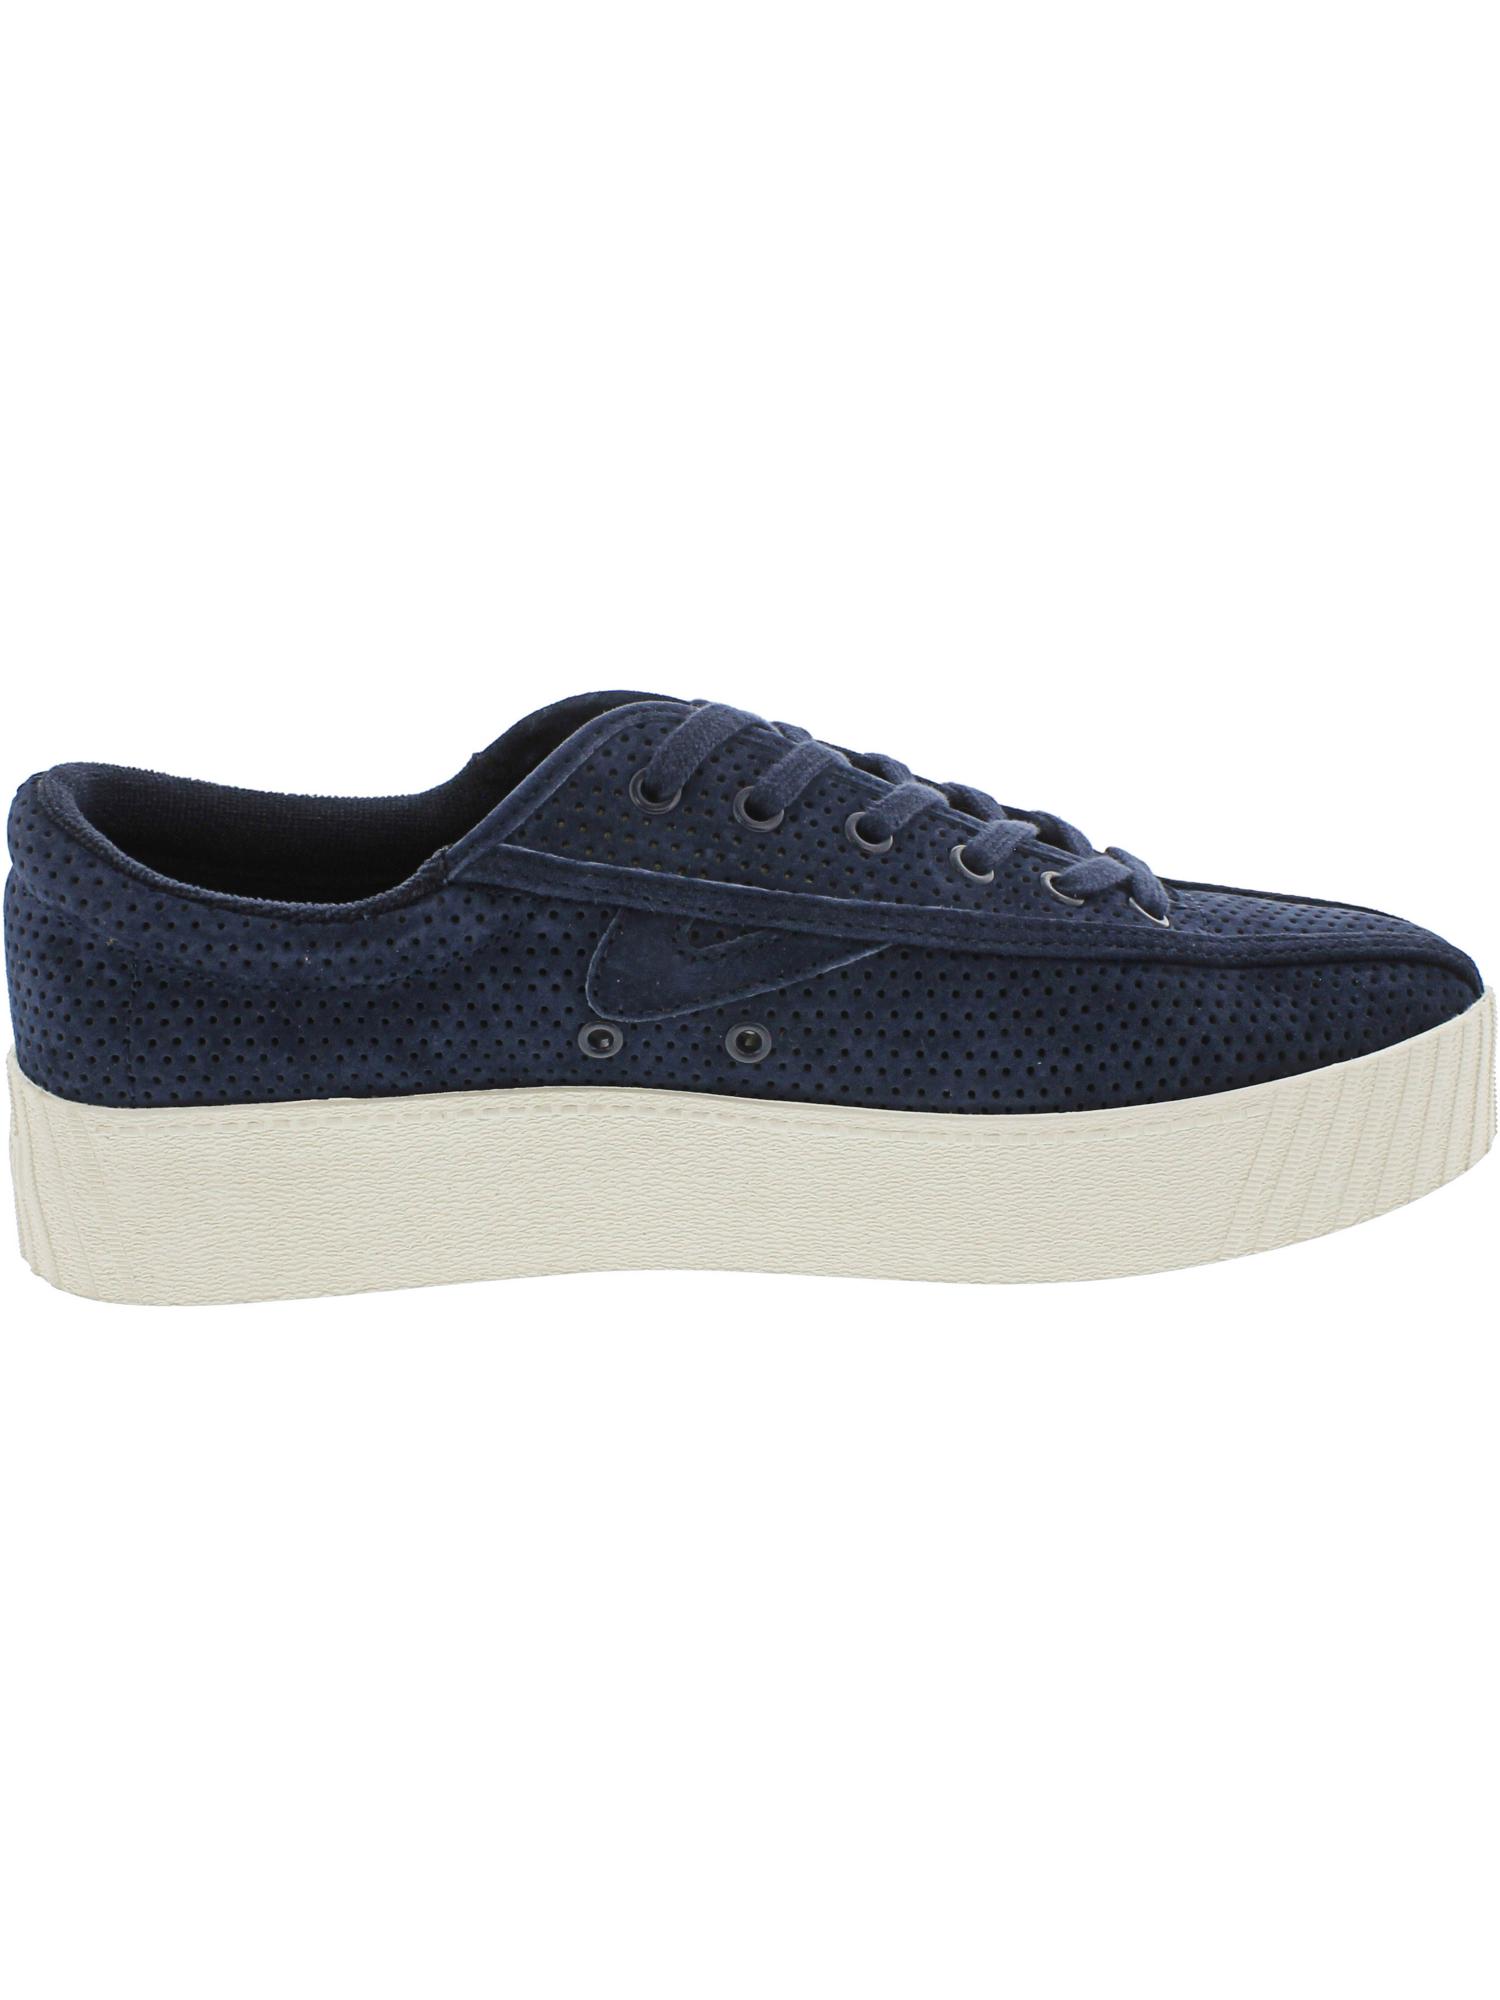 Tretorn-Nylite-3-Bold-Suede-Fashion-Sneaker thumbnail 18